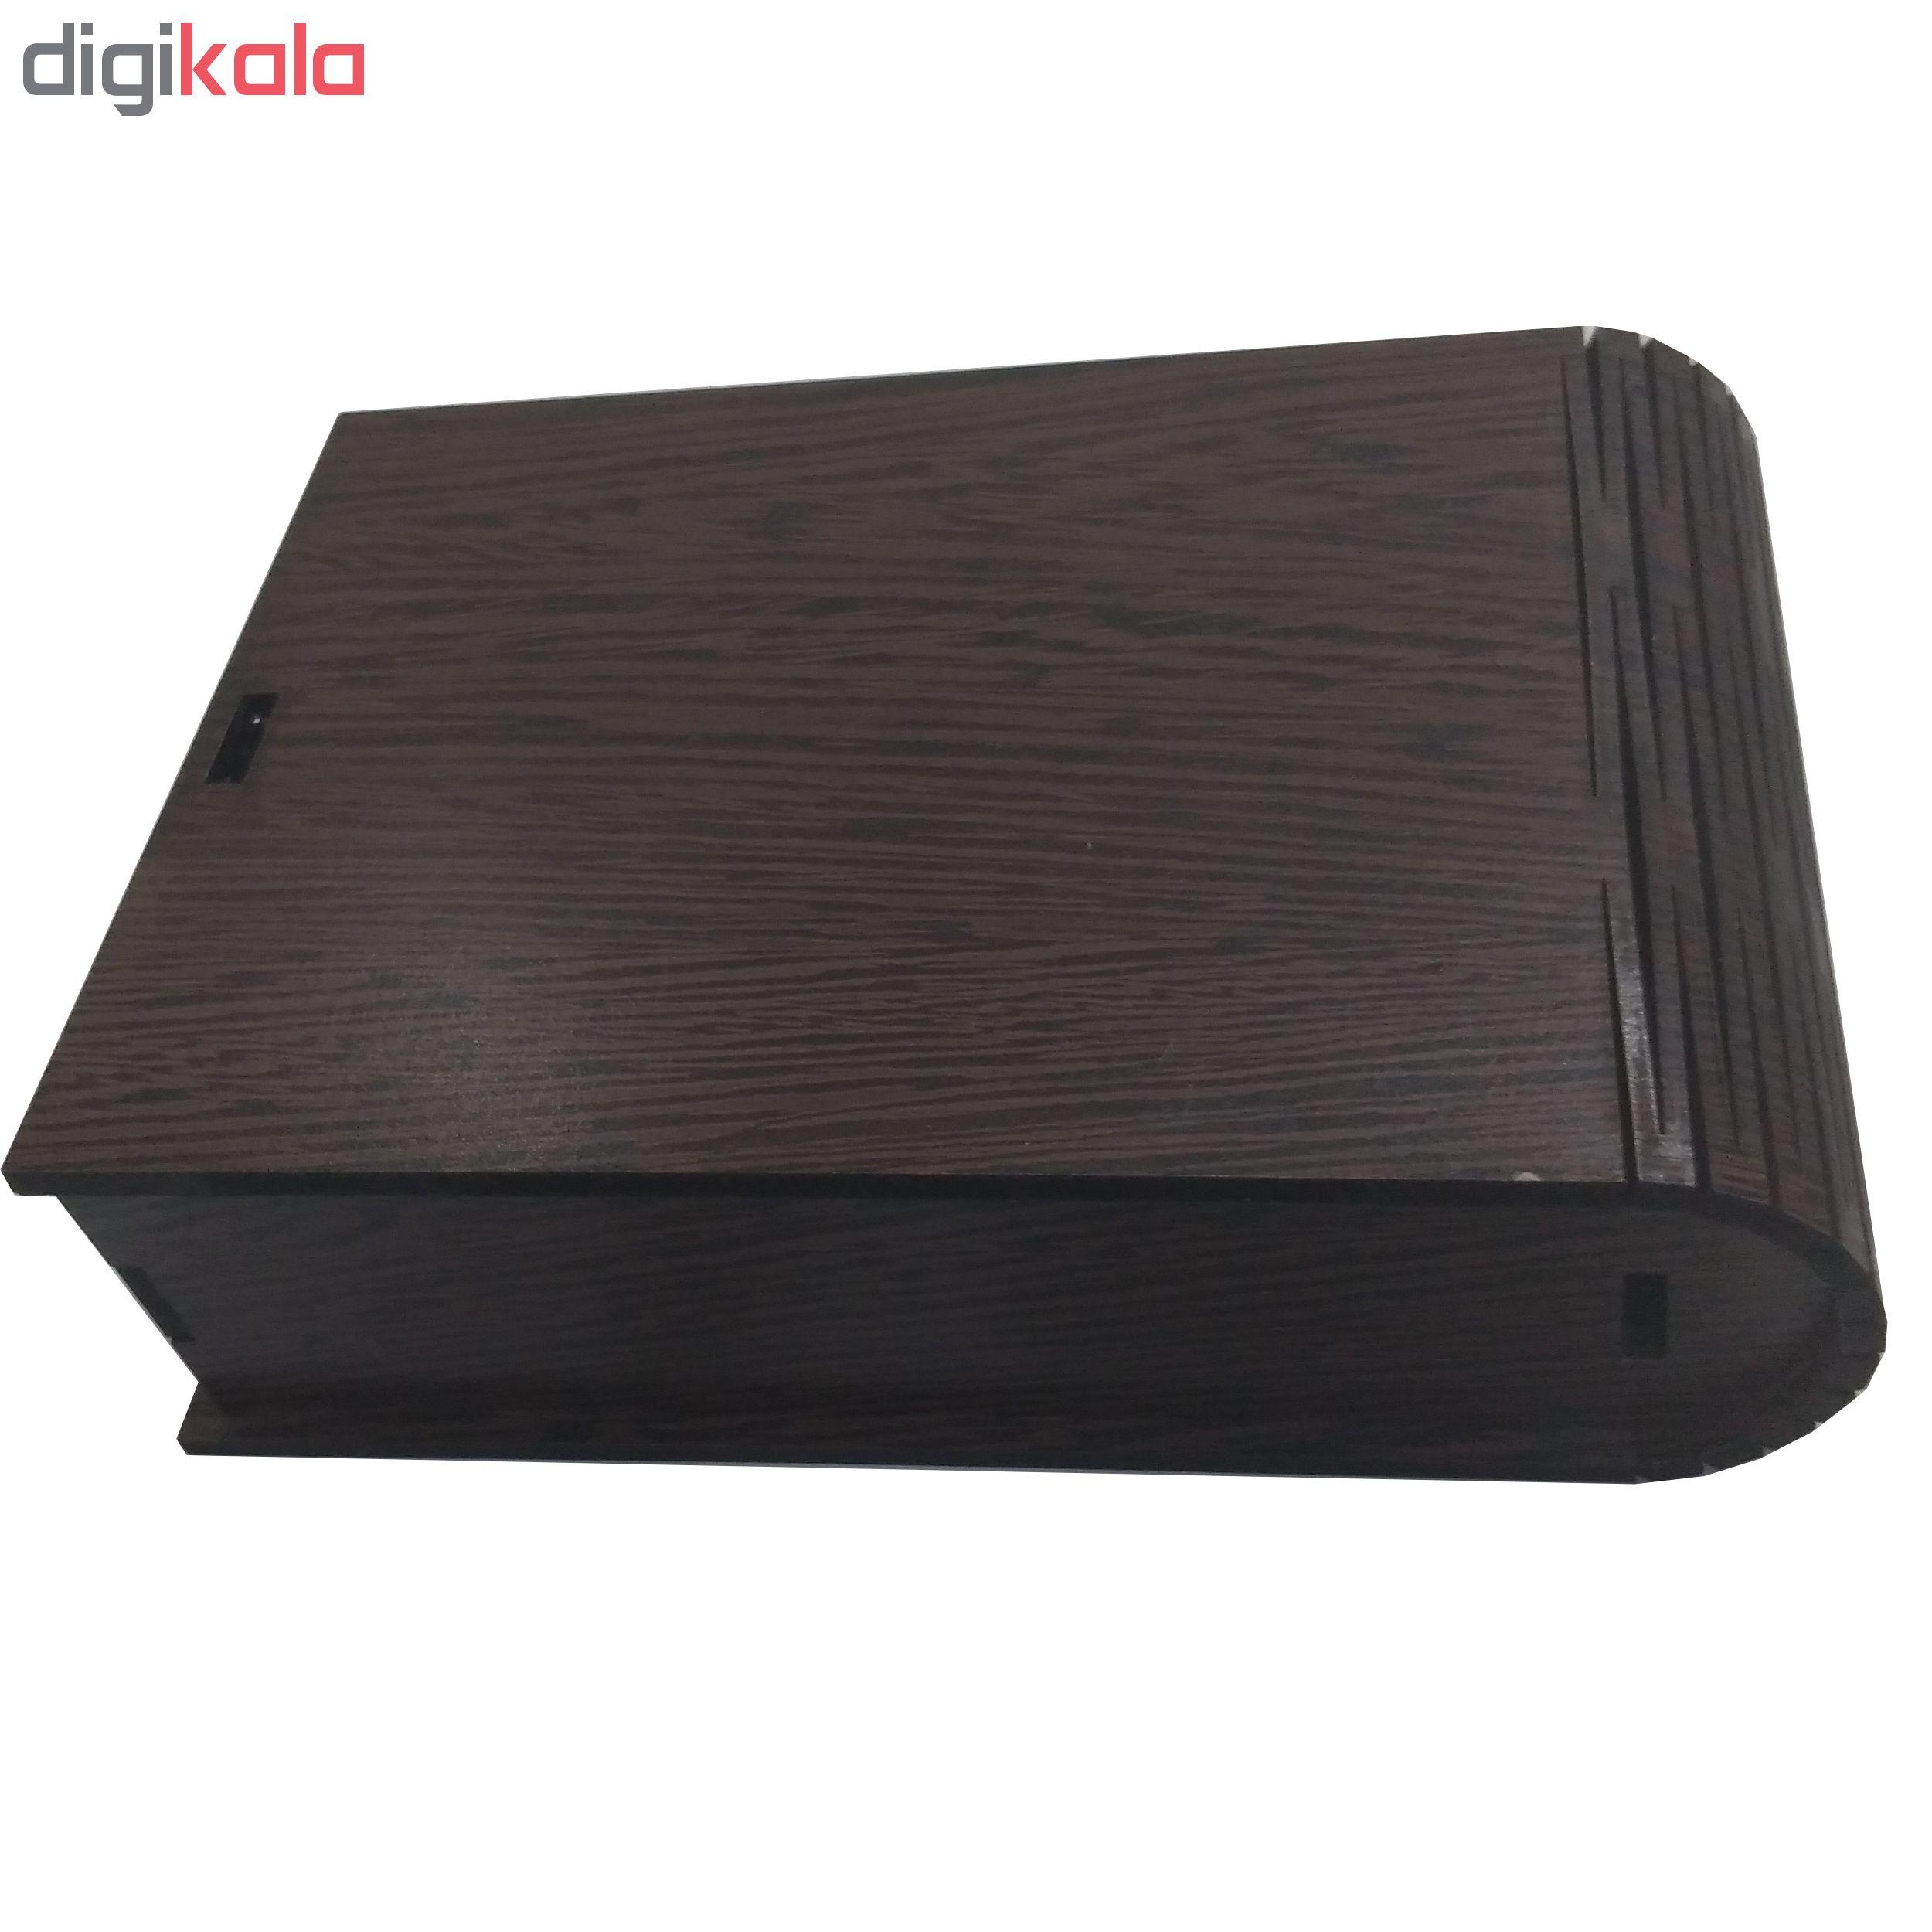 جعبه هدیه مدل nimda کد nd-18